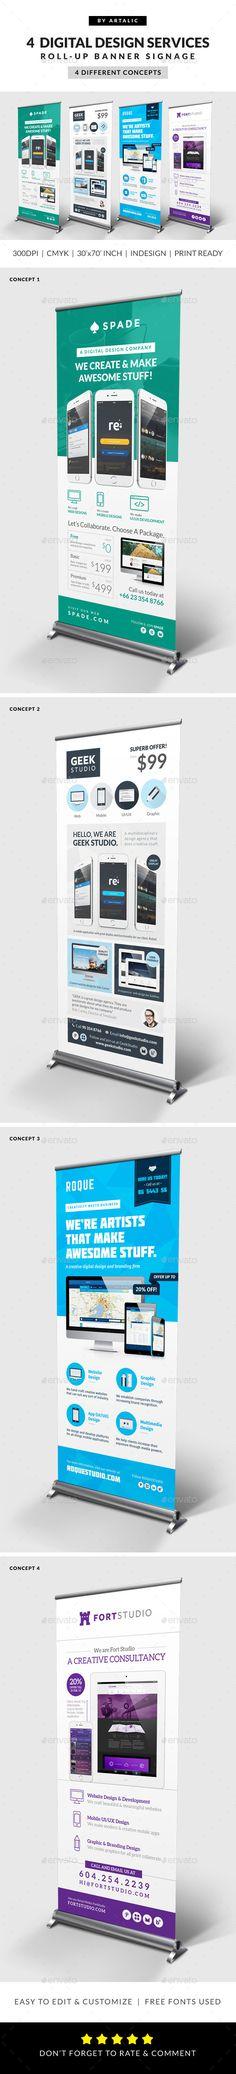 Design Agency/Studio Services Template #design Download: http://graphicriver.net/item/design-agencystudio-services/9343745?ref=ksioks